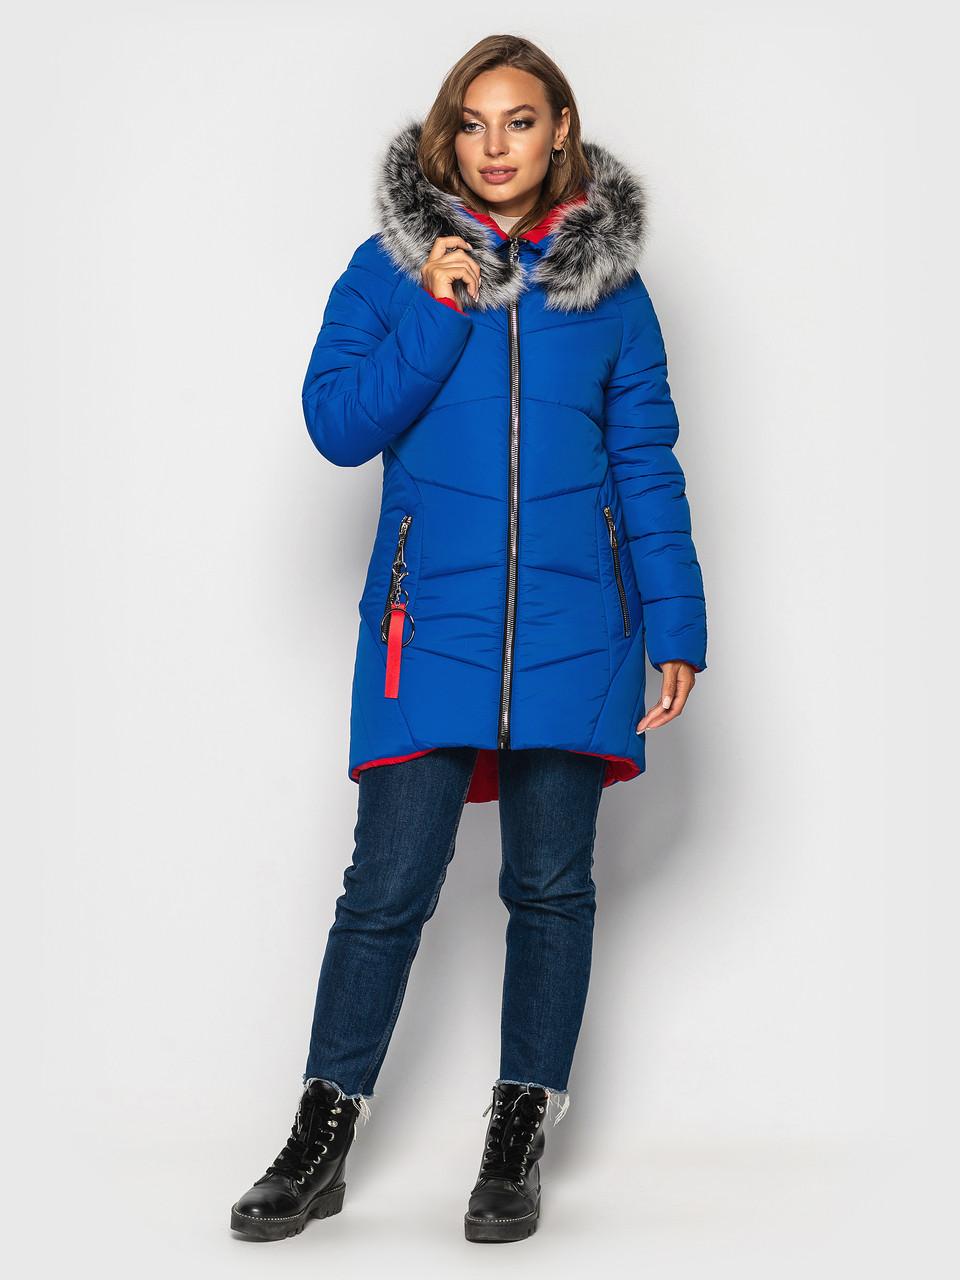 Зимняя куртка К 00318 с 02